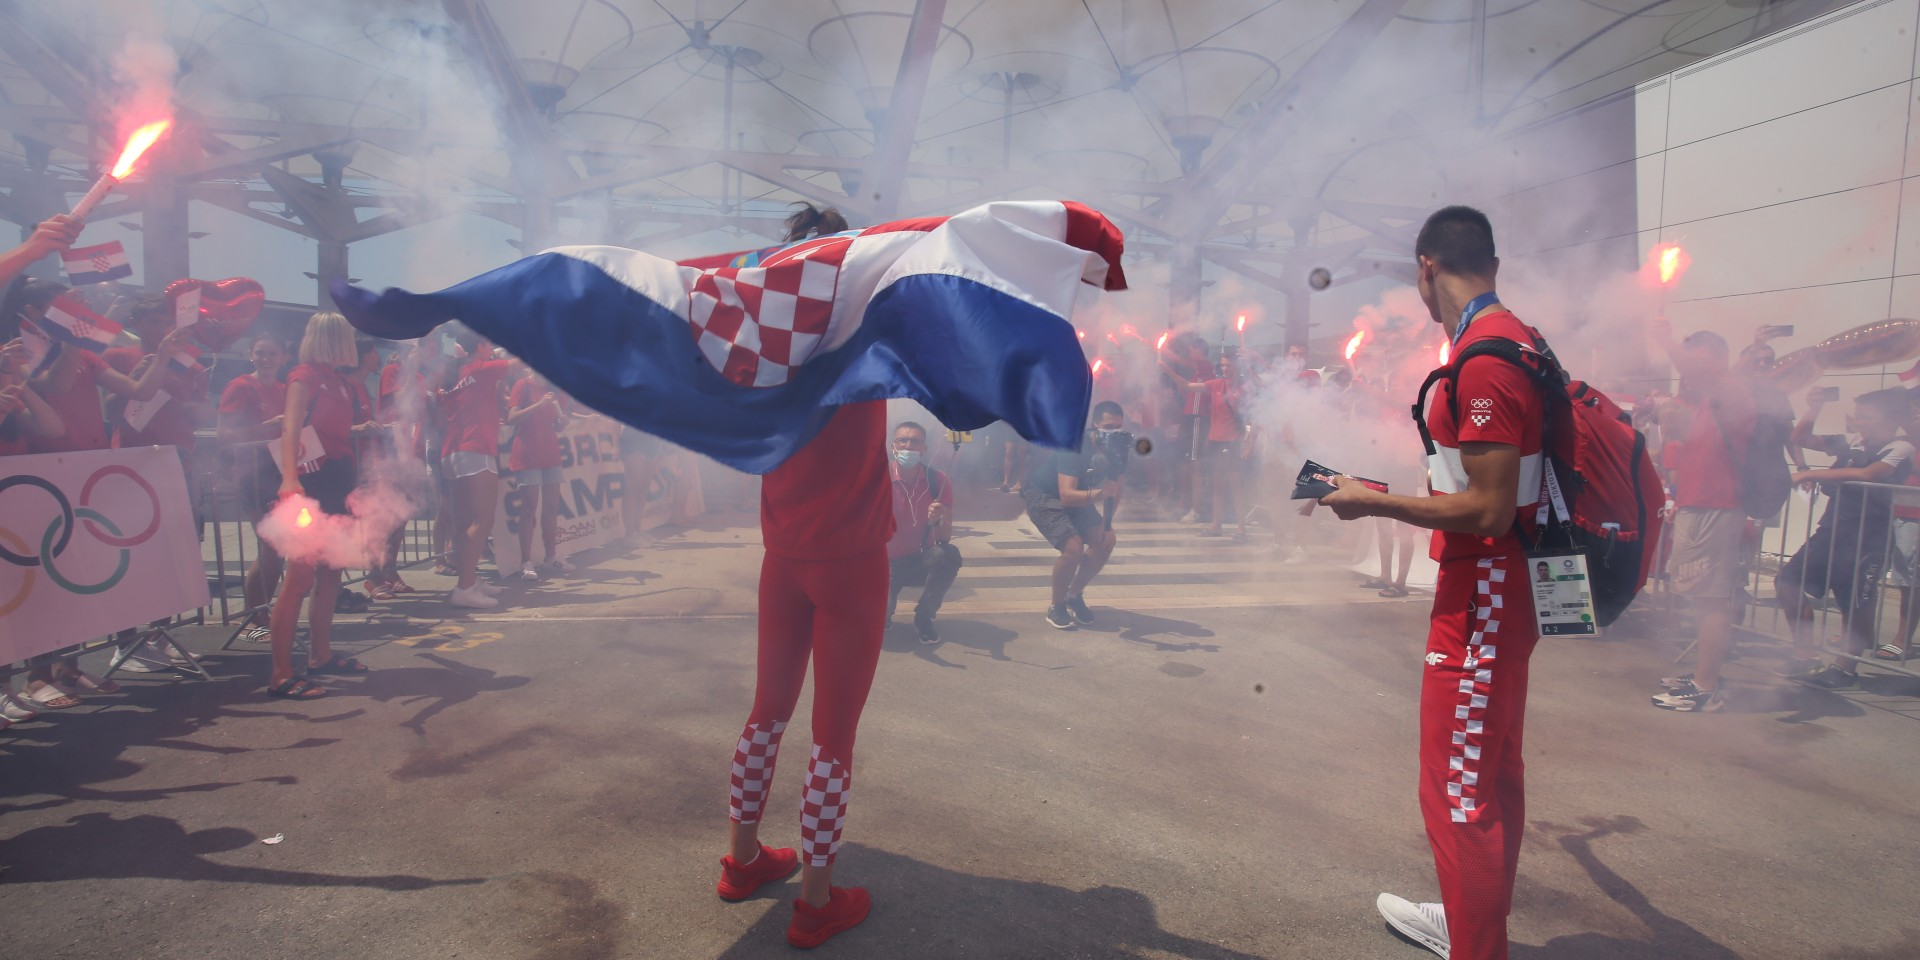 FOTO/VIDEO Špalir za olimpijce